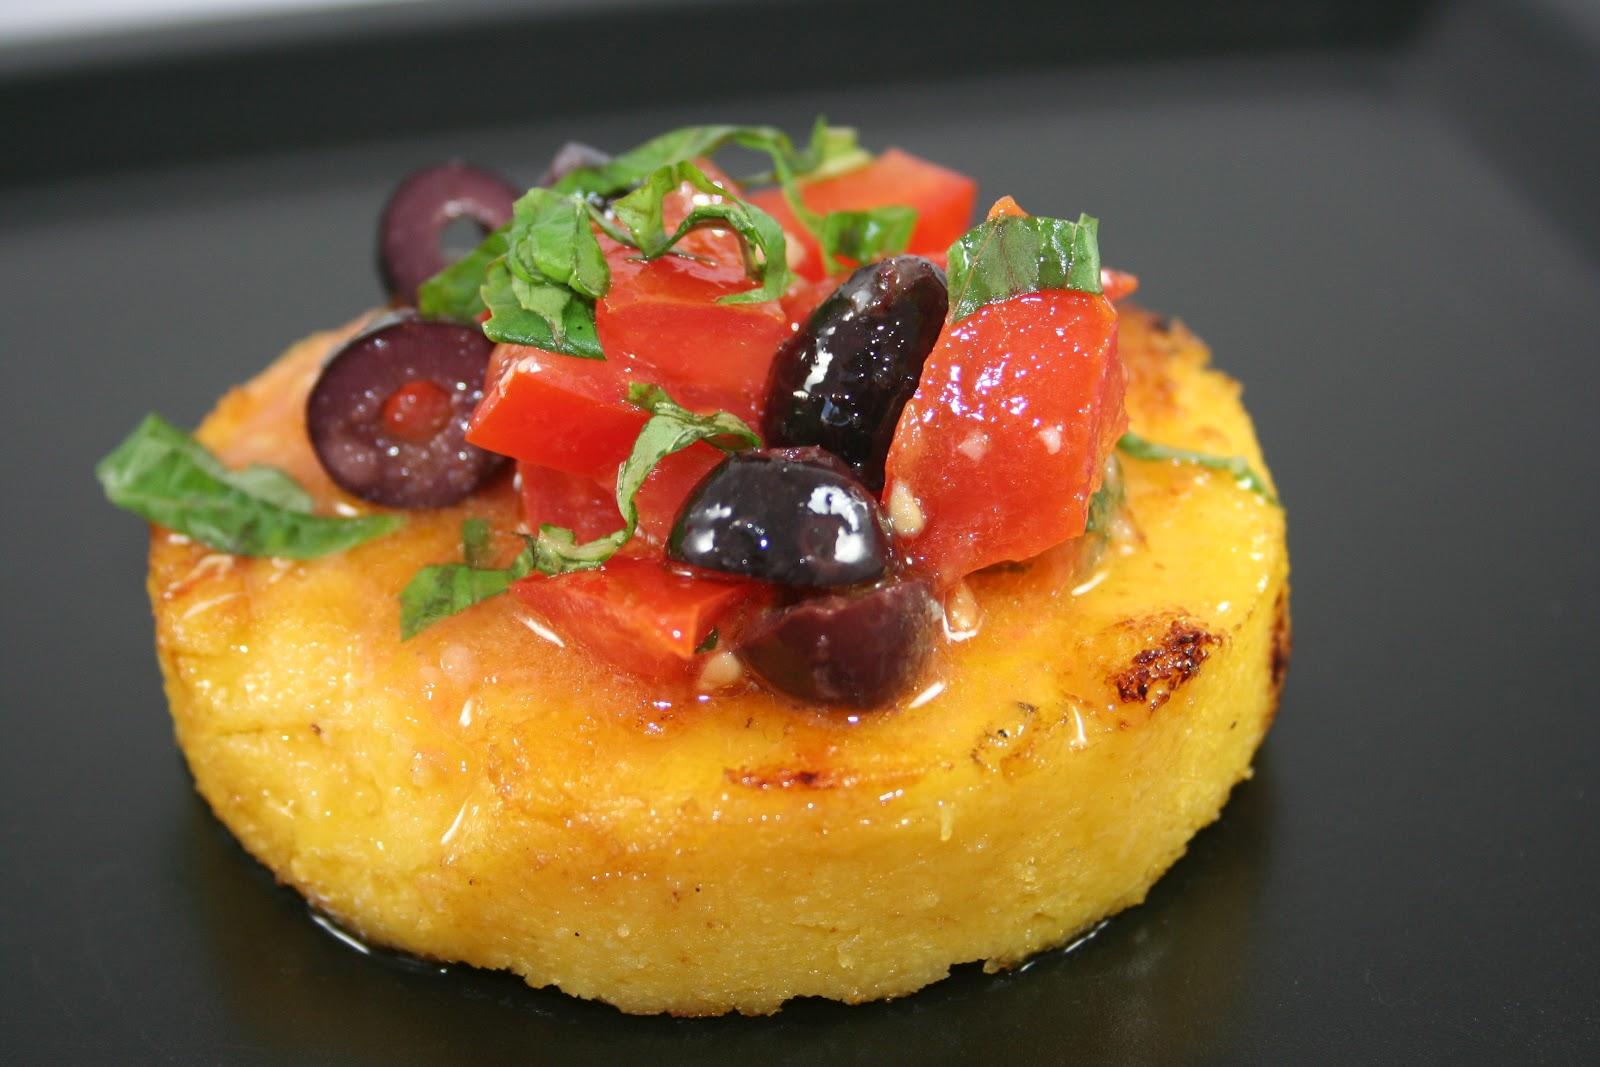 Crostini and Chianti: Grilled Polenta Cakes